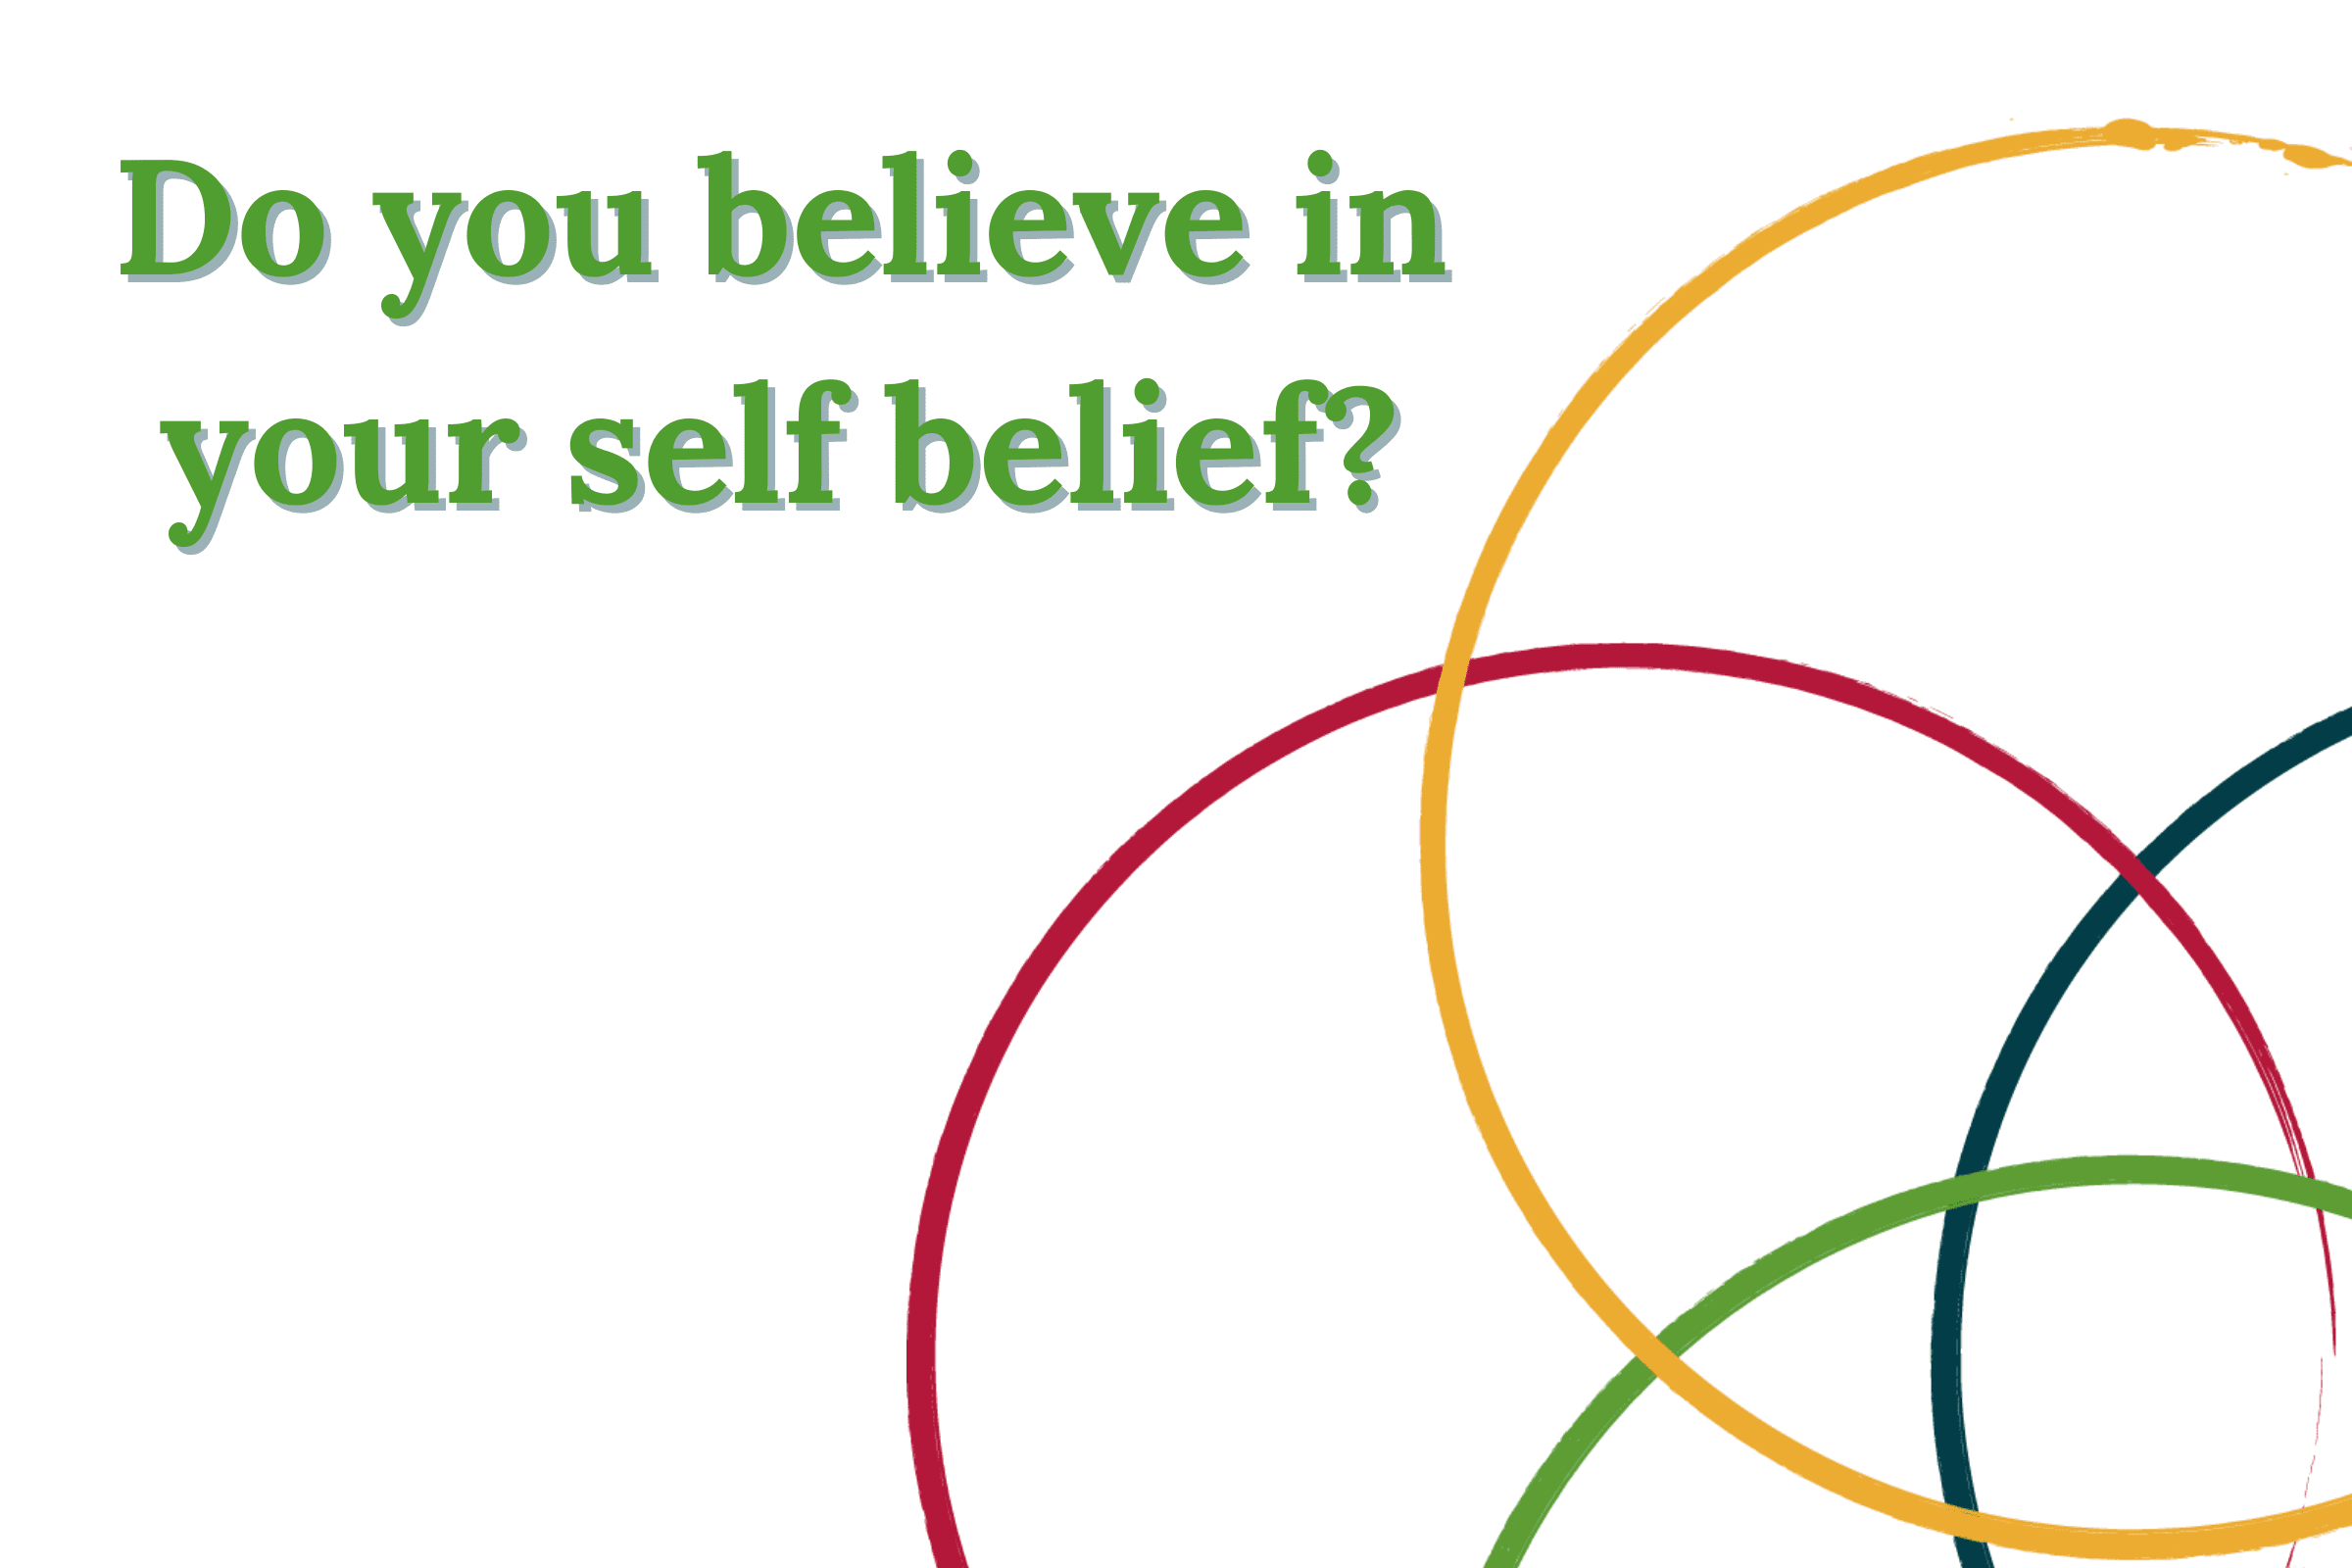 Do you believe in your self belief?